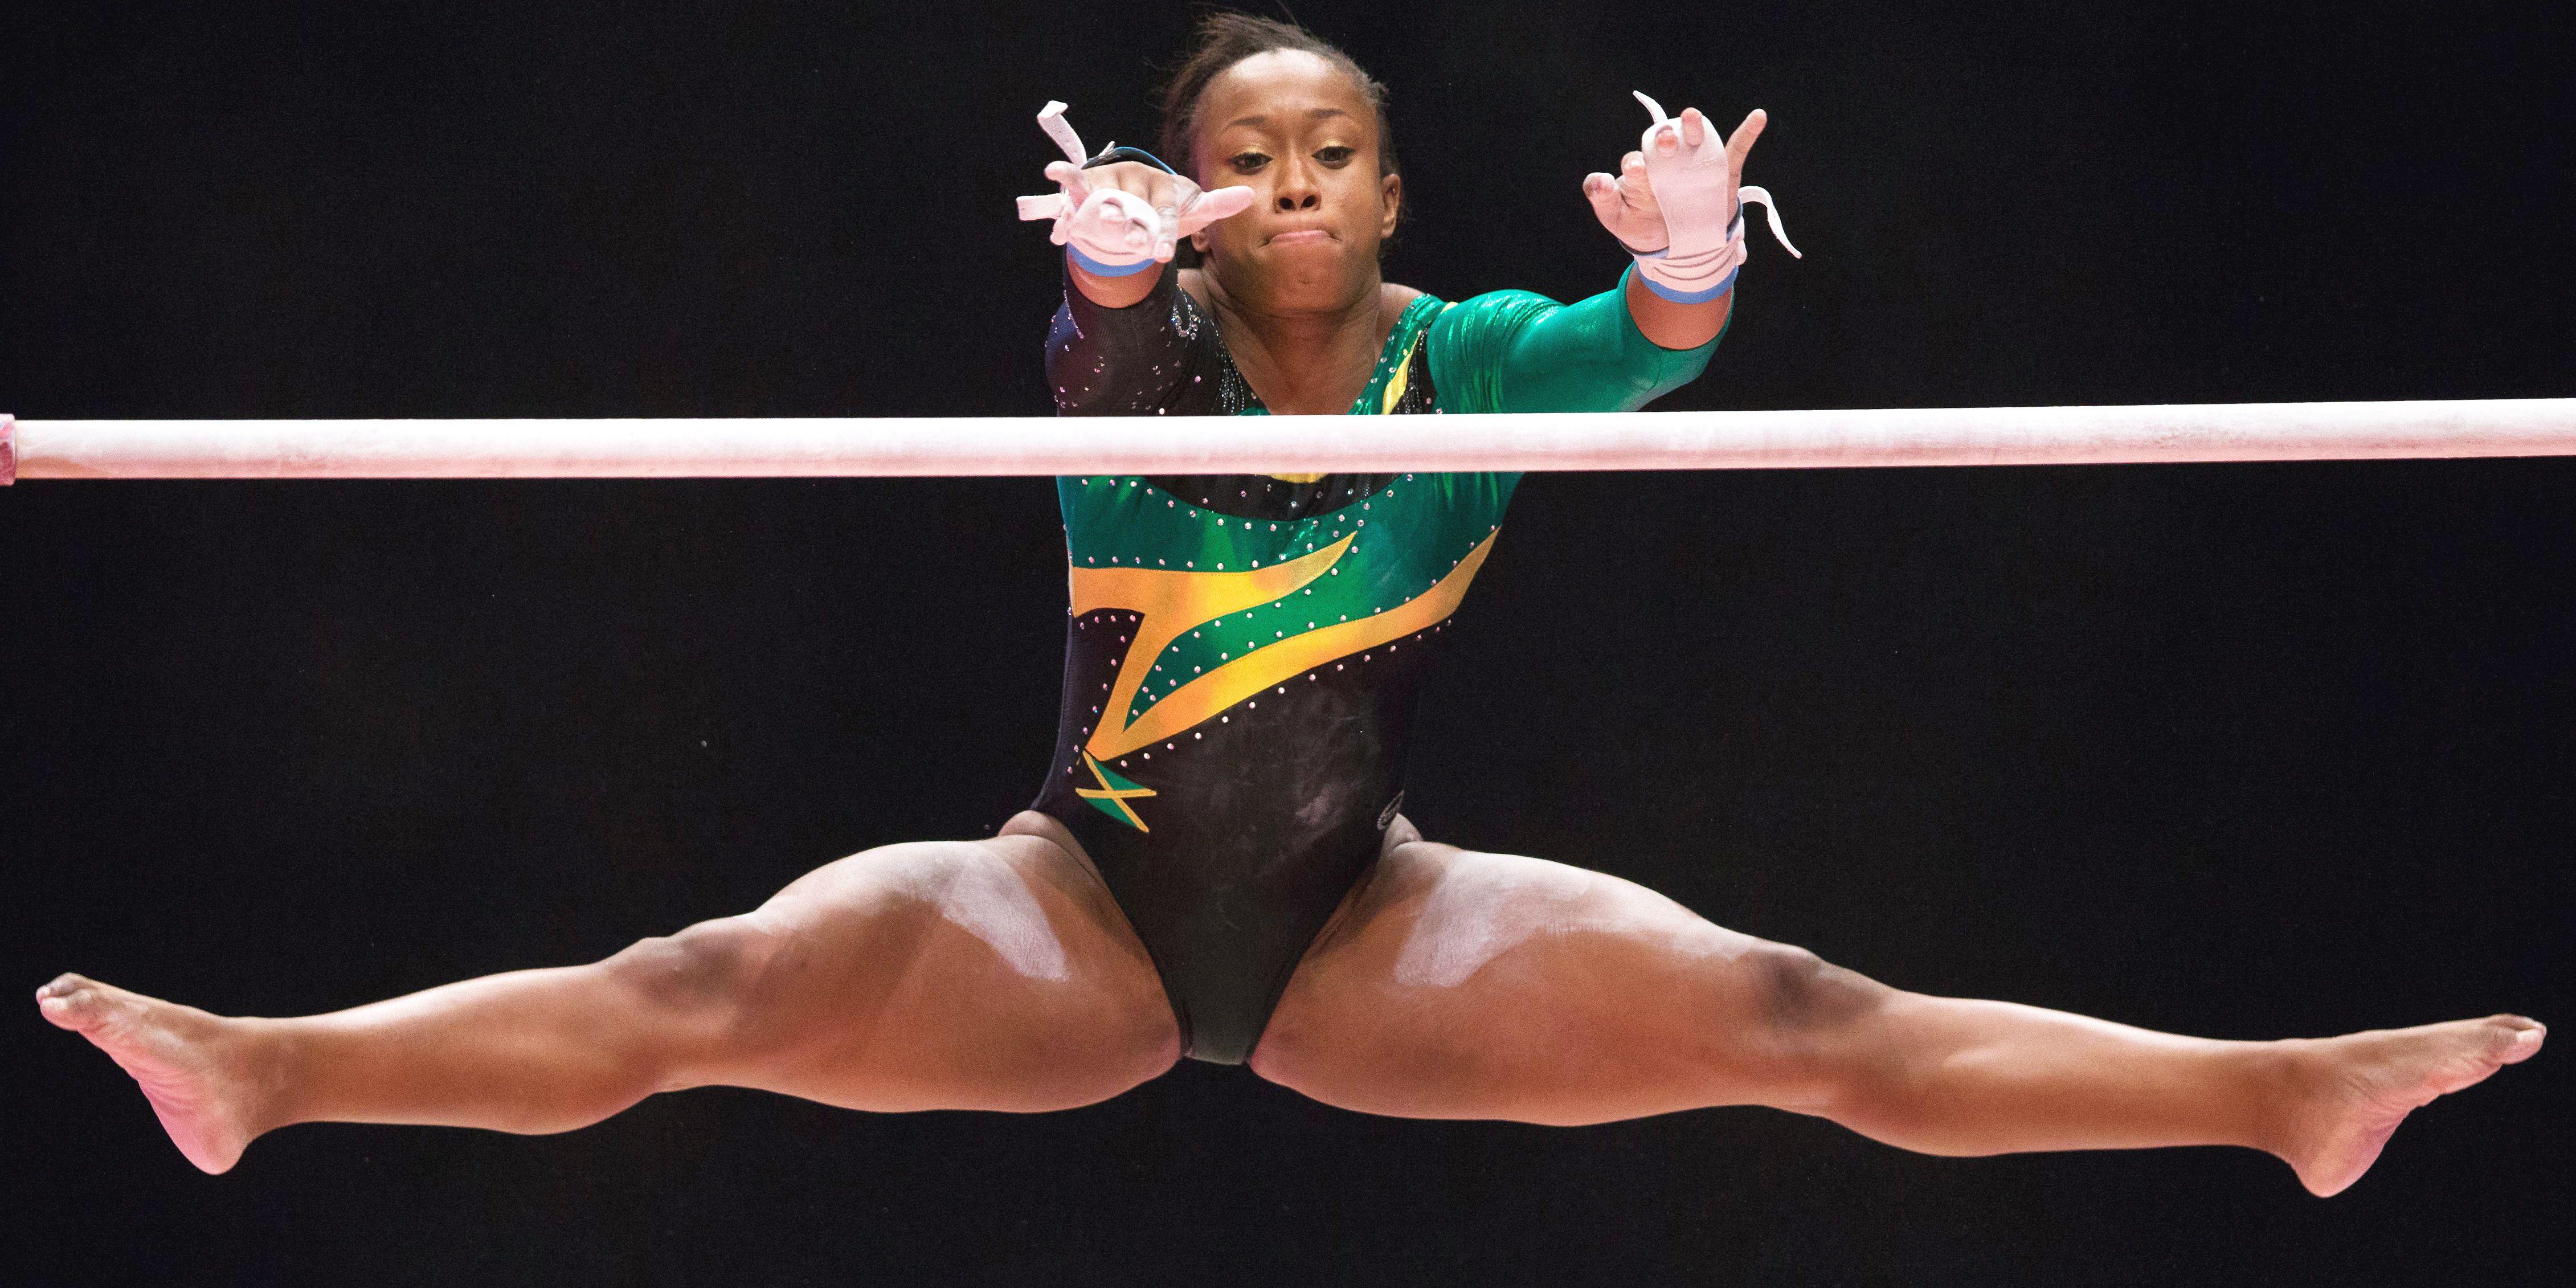 Naked Gymnast Huge Boobs